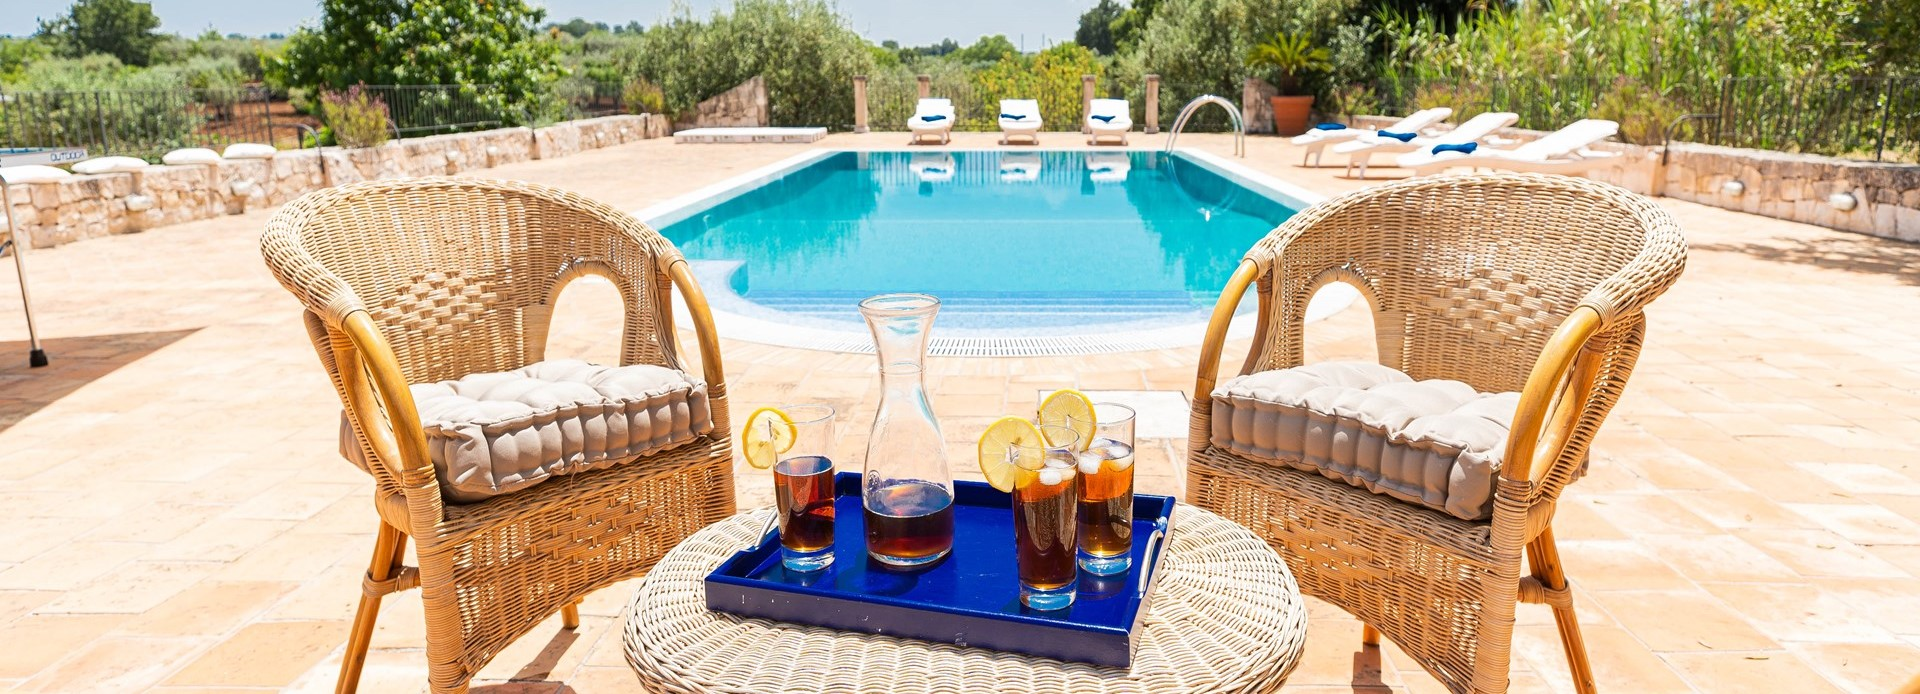 trulli-volpe-puglia-poolside-seating